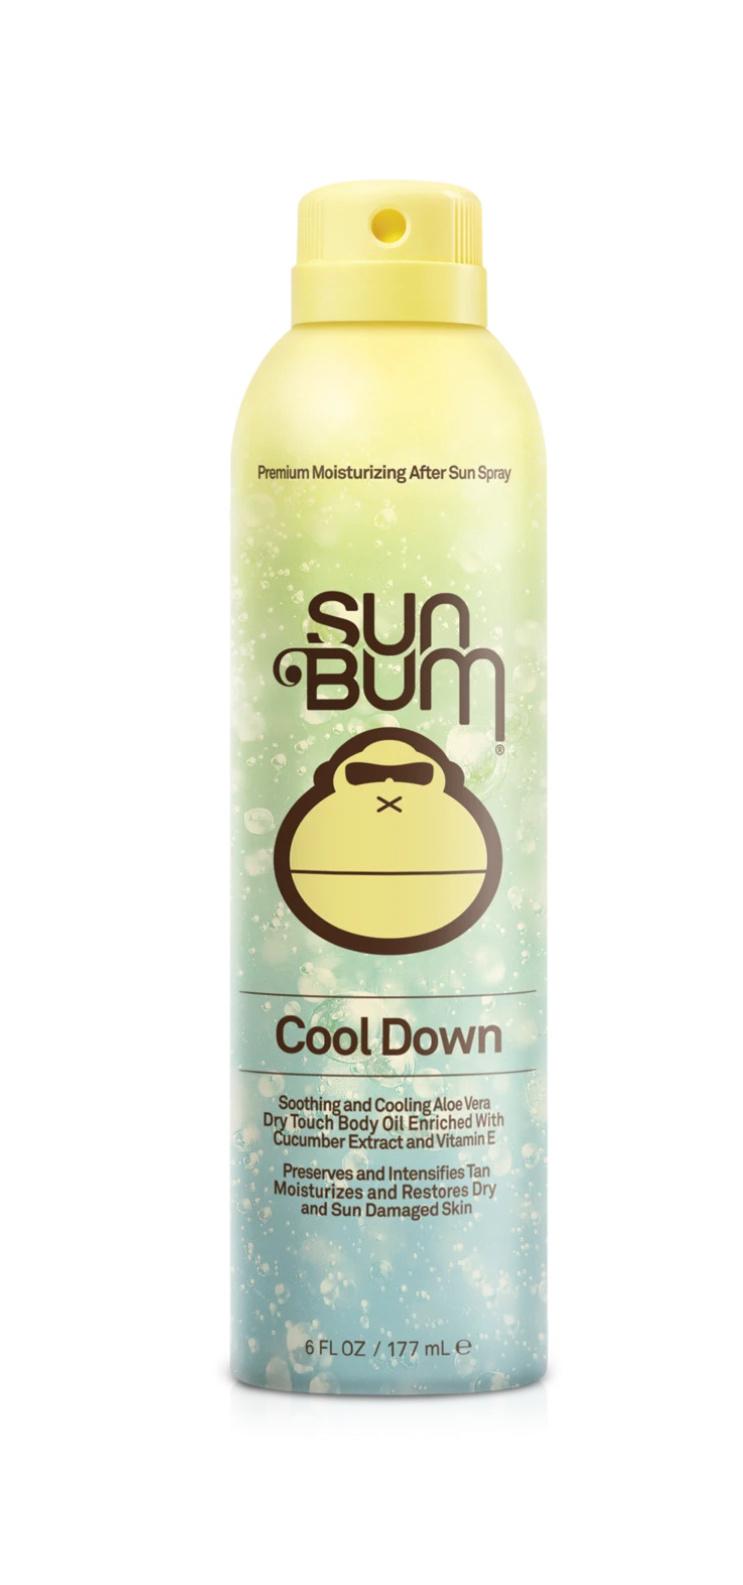 Sun Bum Sun Bum Cool Down Spray